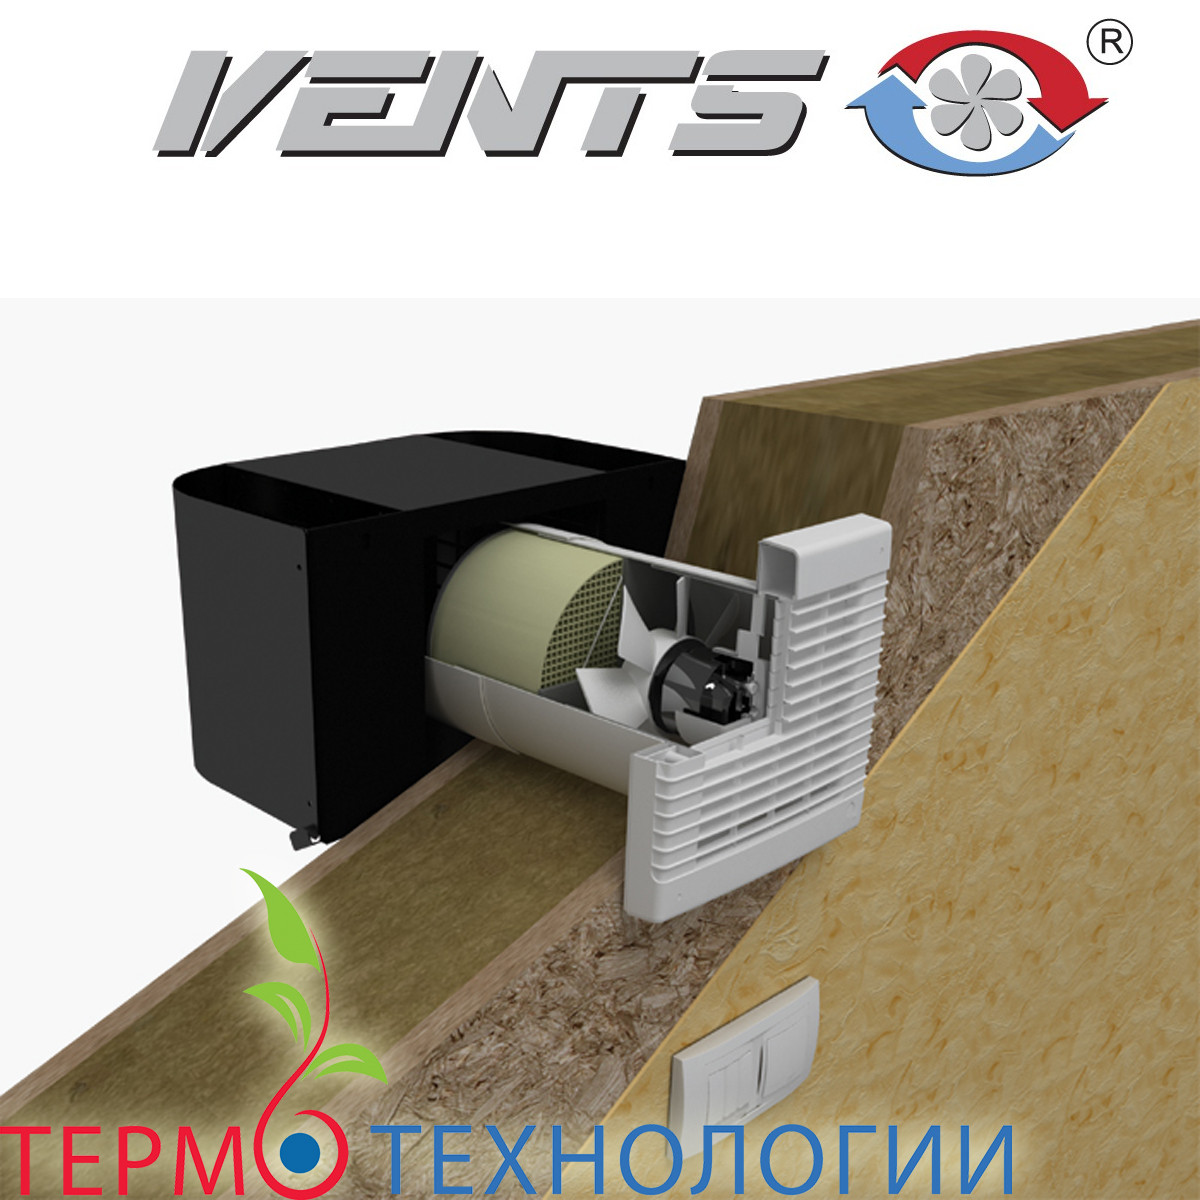 Рекуператор Vents ТвинФреш для помещения до 20 м.кв.